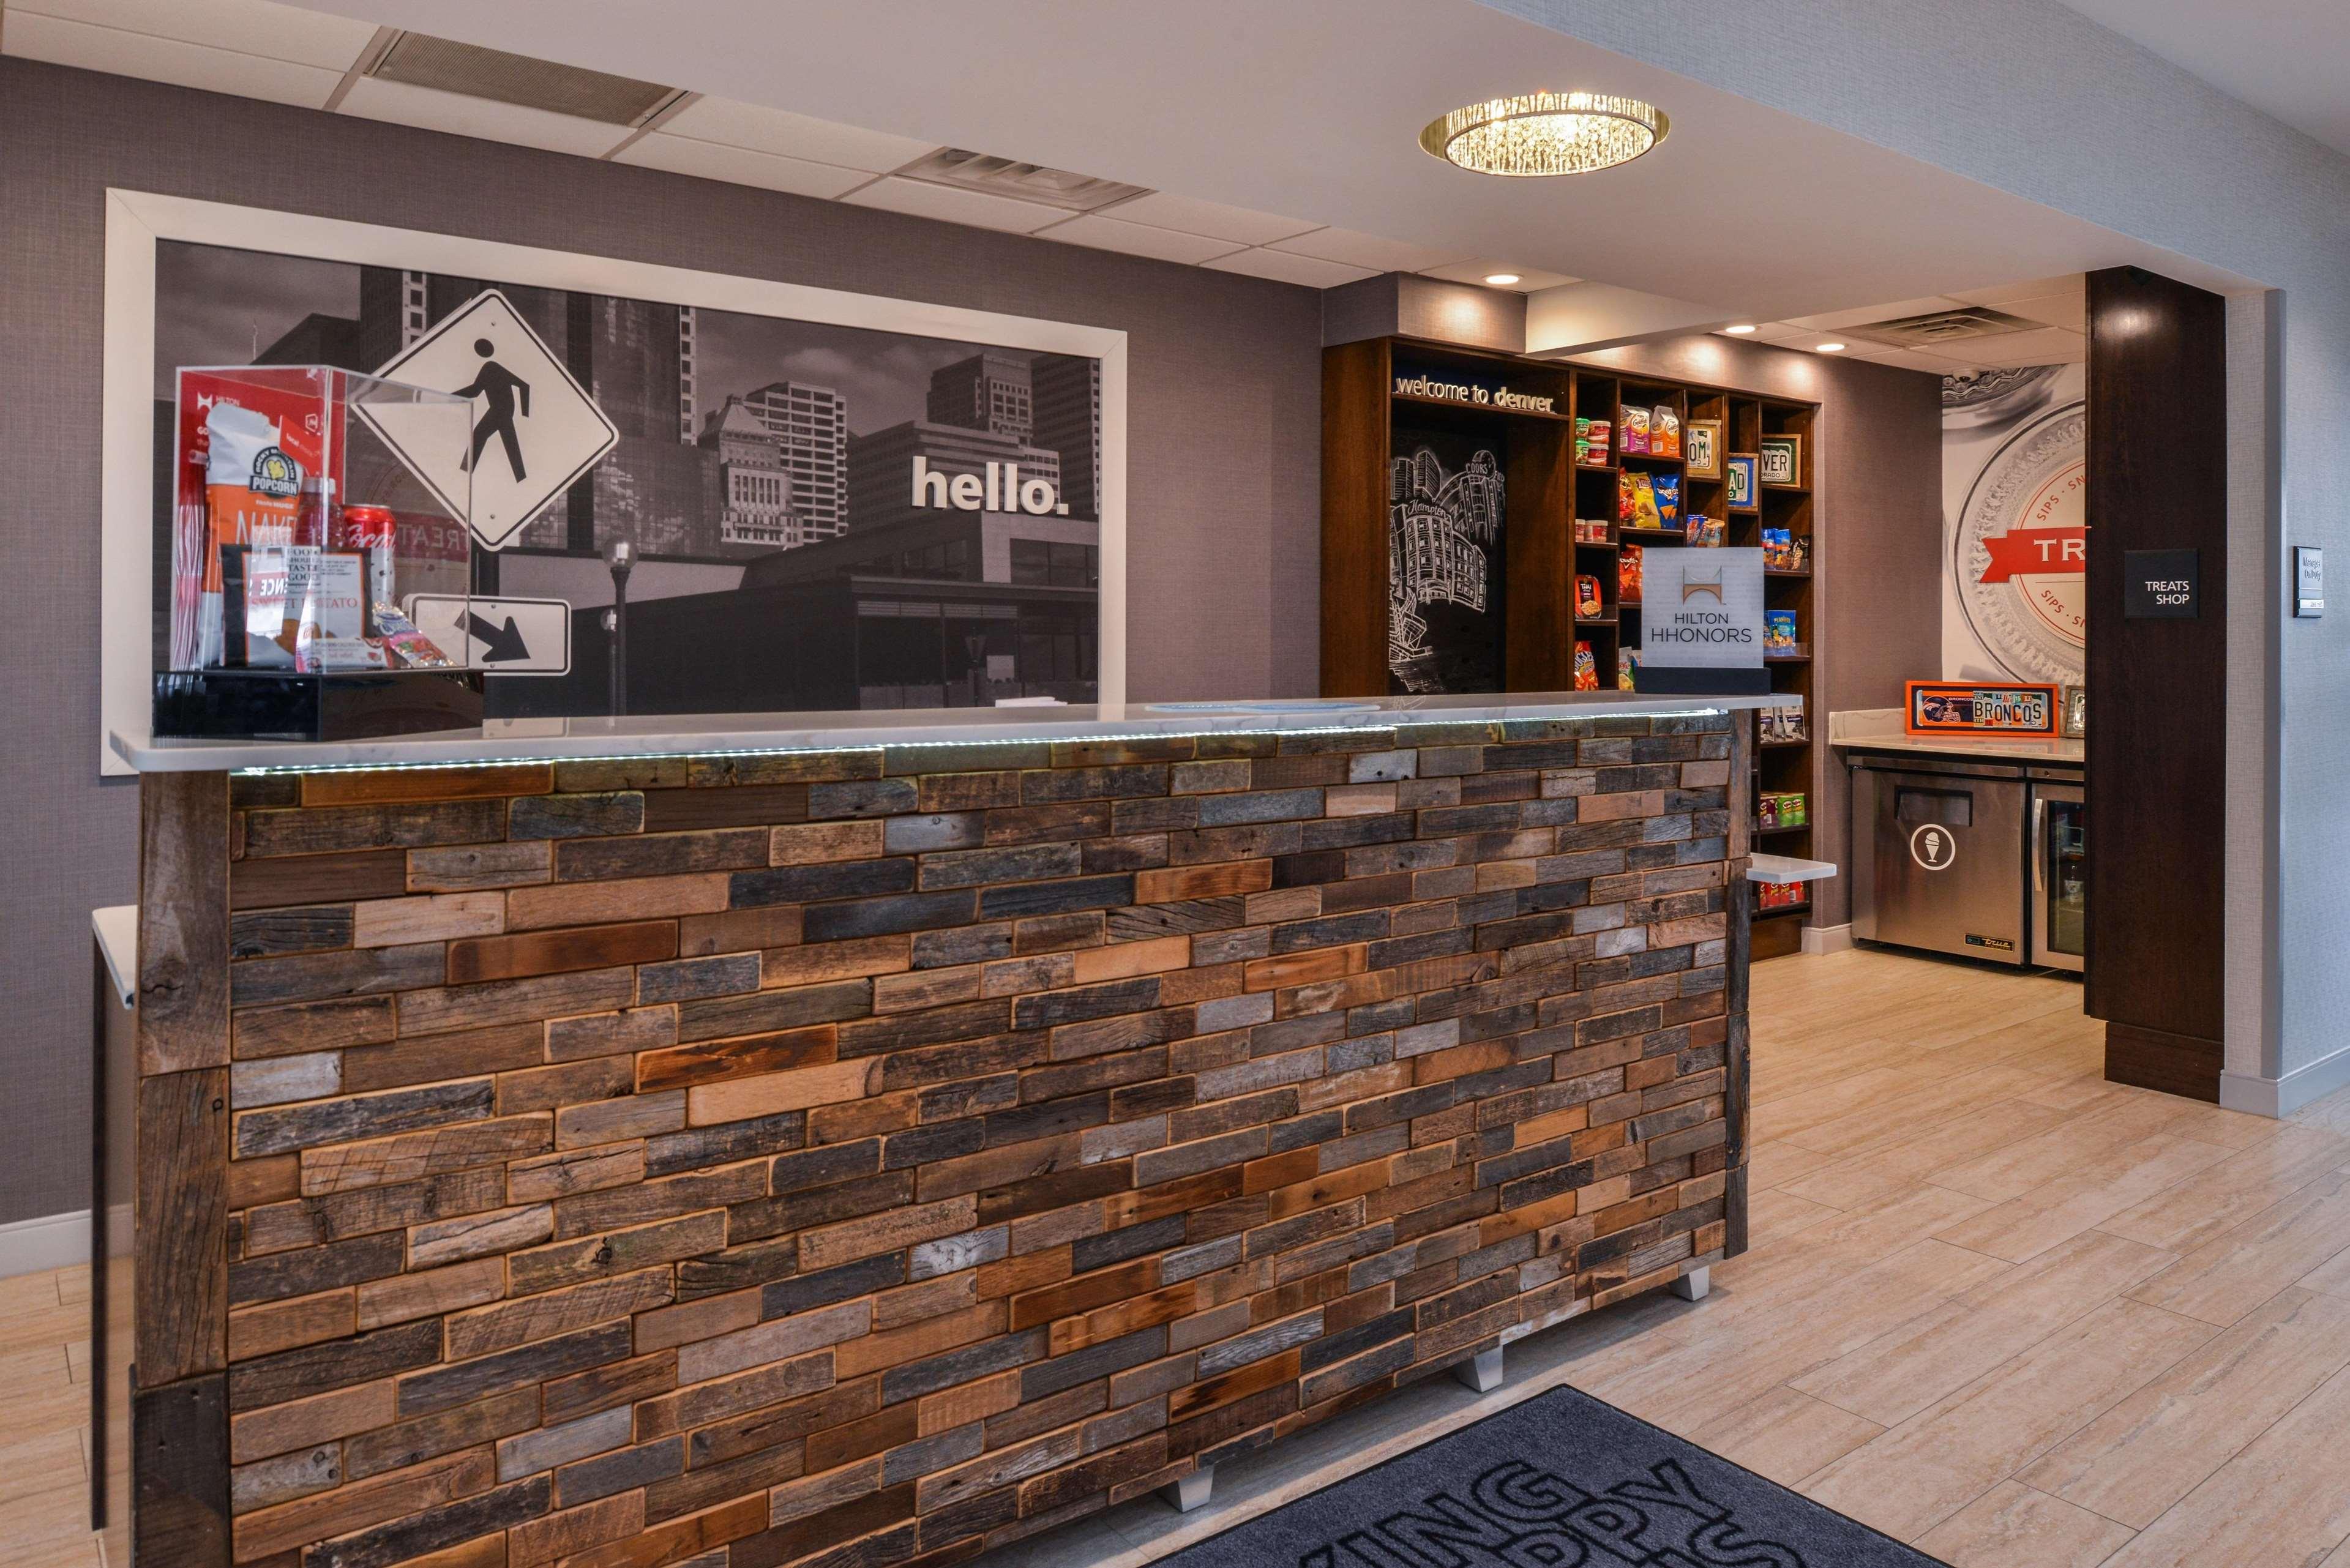 Hampton Inn & Suites Denver-Speer Boulevard image 15